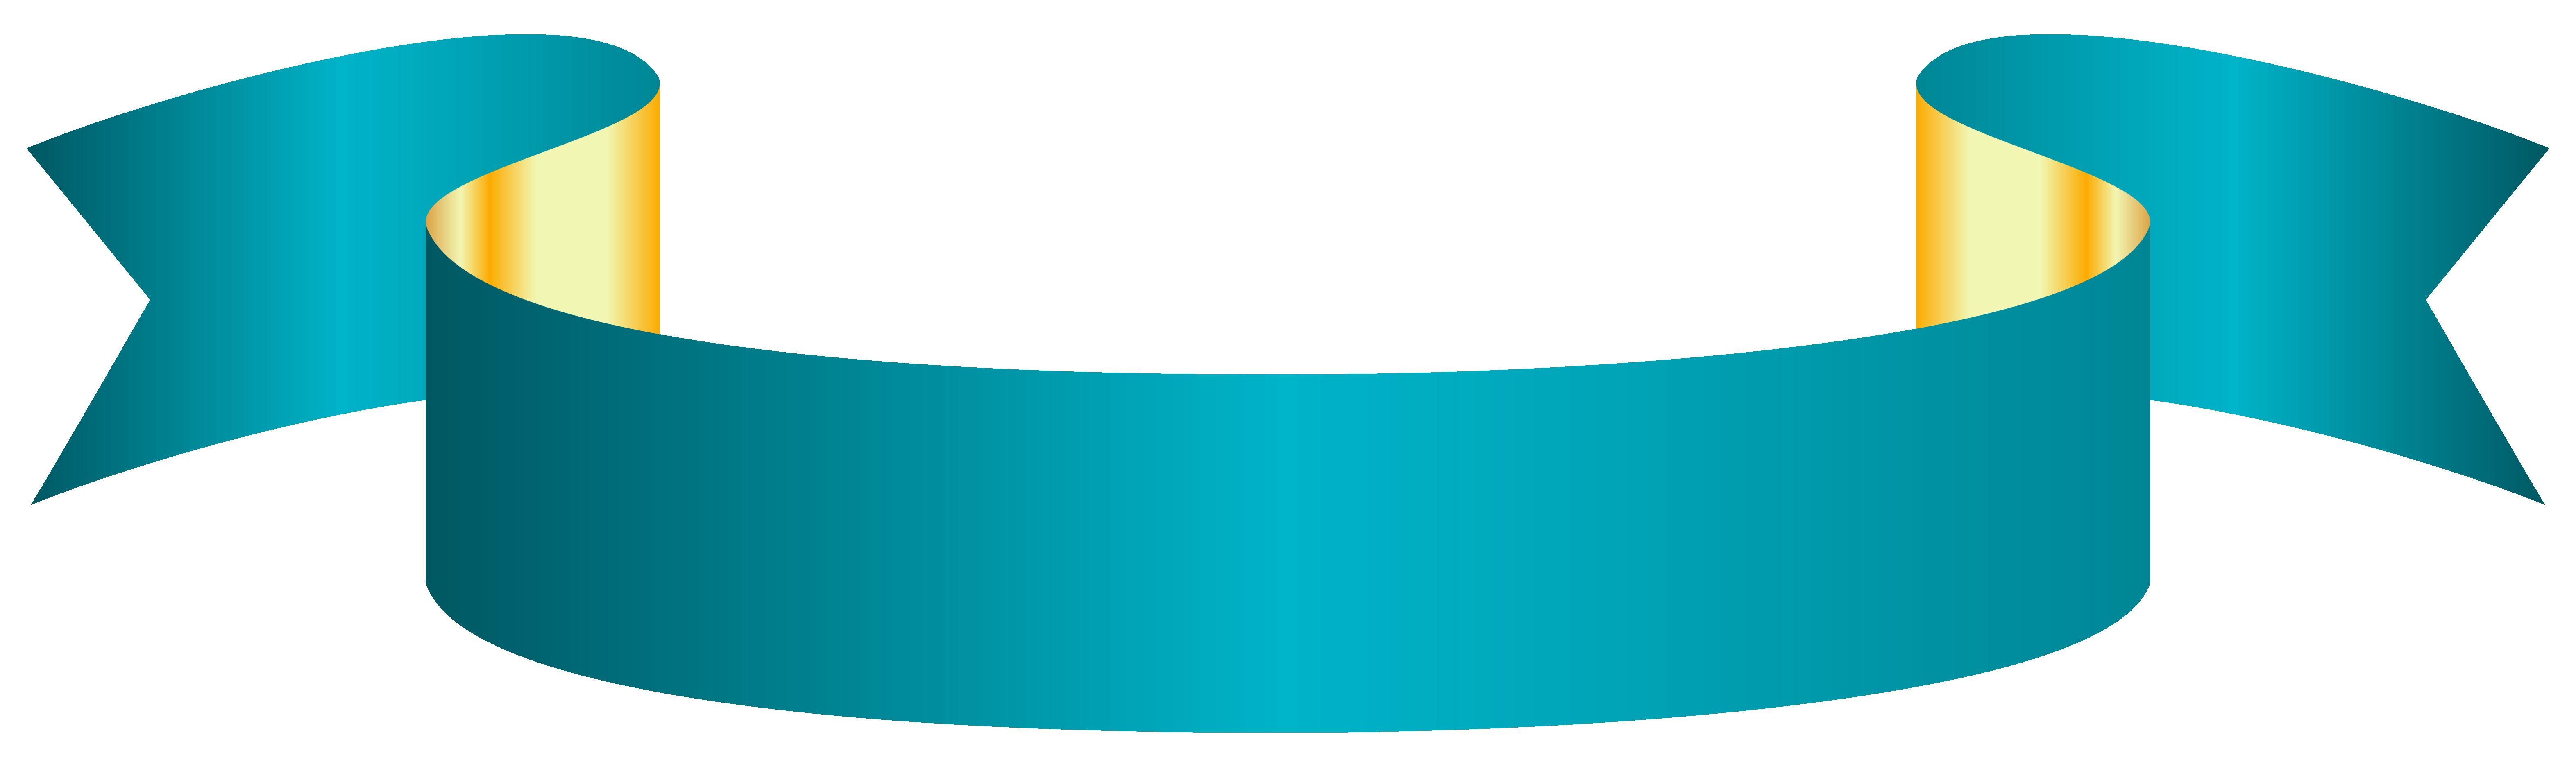 6288x1861 Blue Banner Transparent Png Clip Art Image As Art